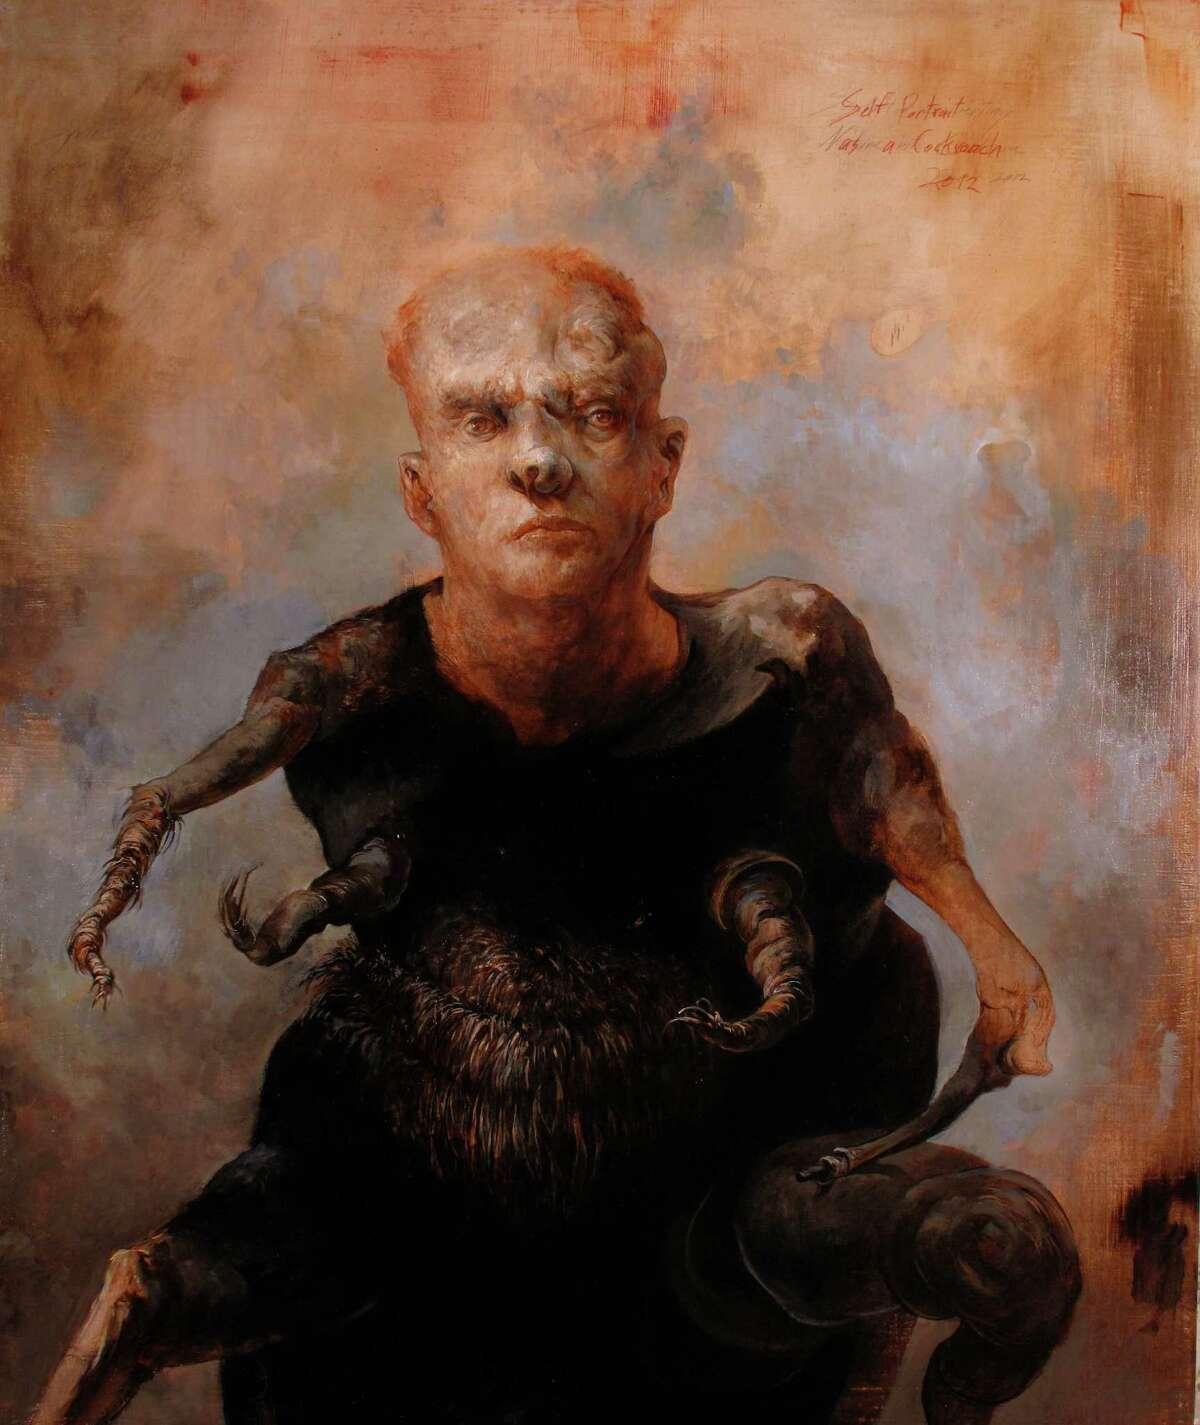 Galveston-based artist Mark Greenwalt will talk about his work Nov. 12 at the Galveston Arts Center.